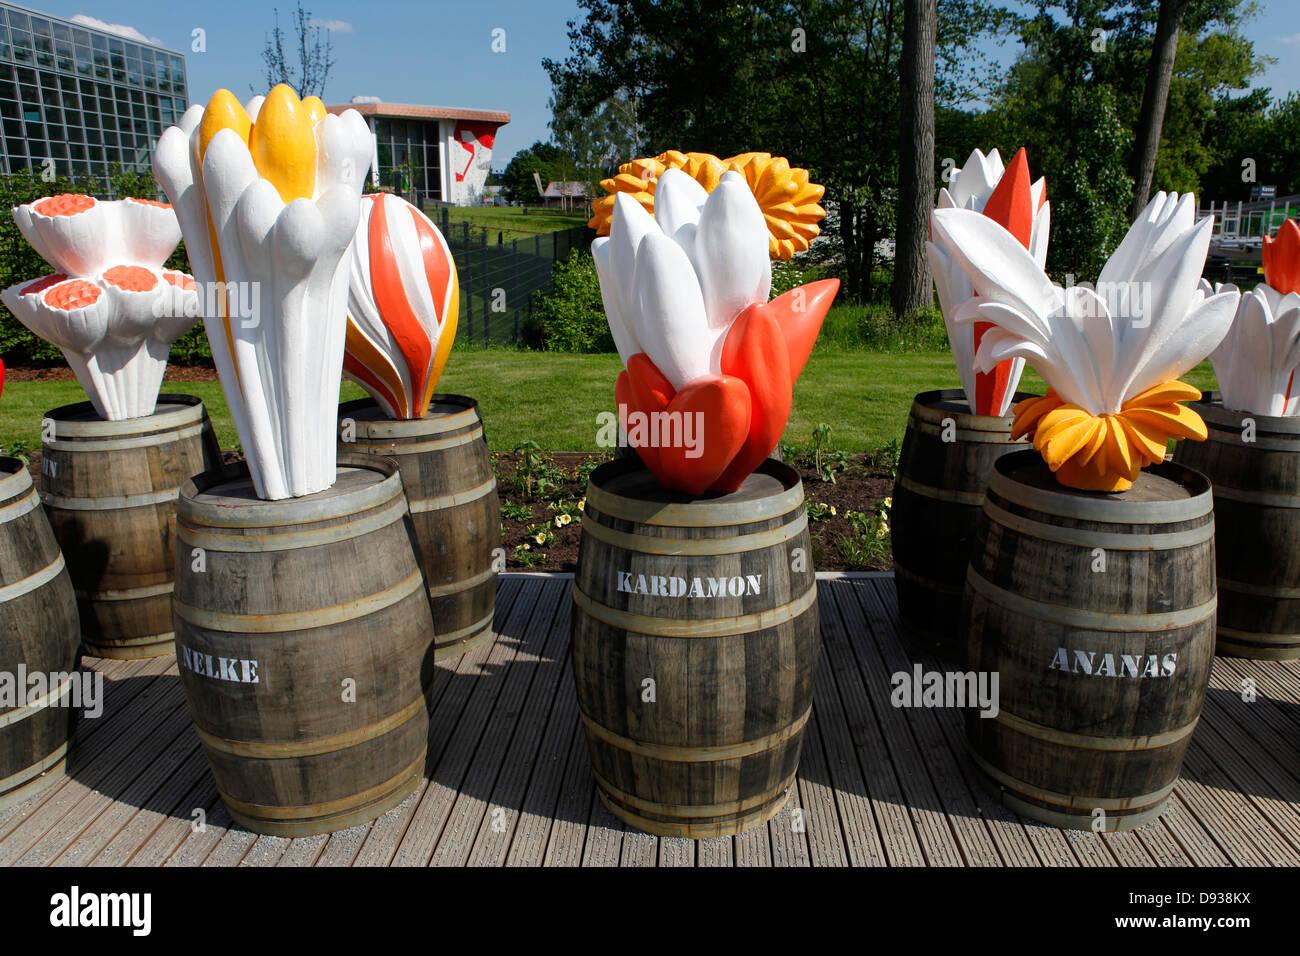 A spice exhibit at the International Garden Show 2013 (IGS) on Wilhelmsburg Island in Hamburg, Germany. Stock Photo